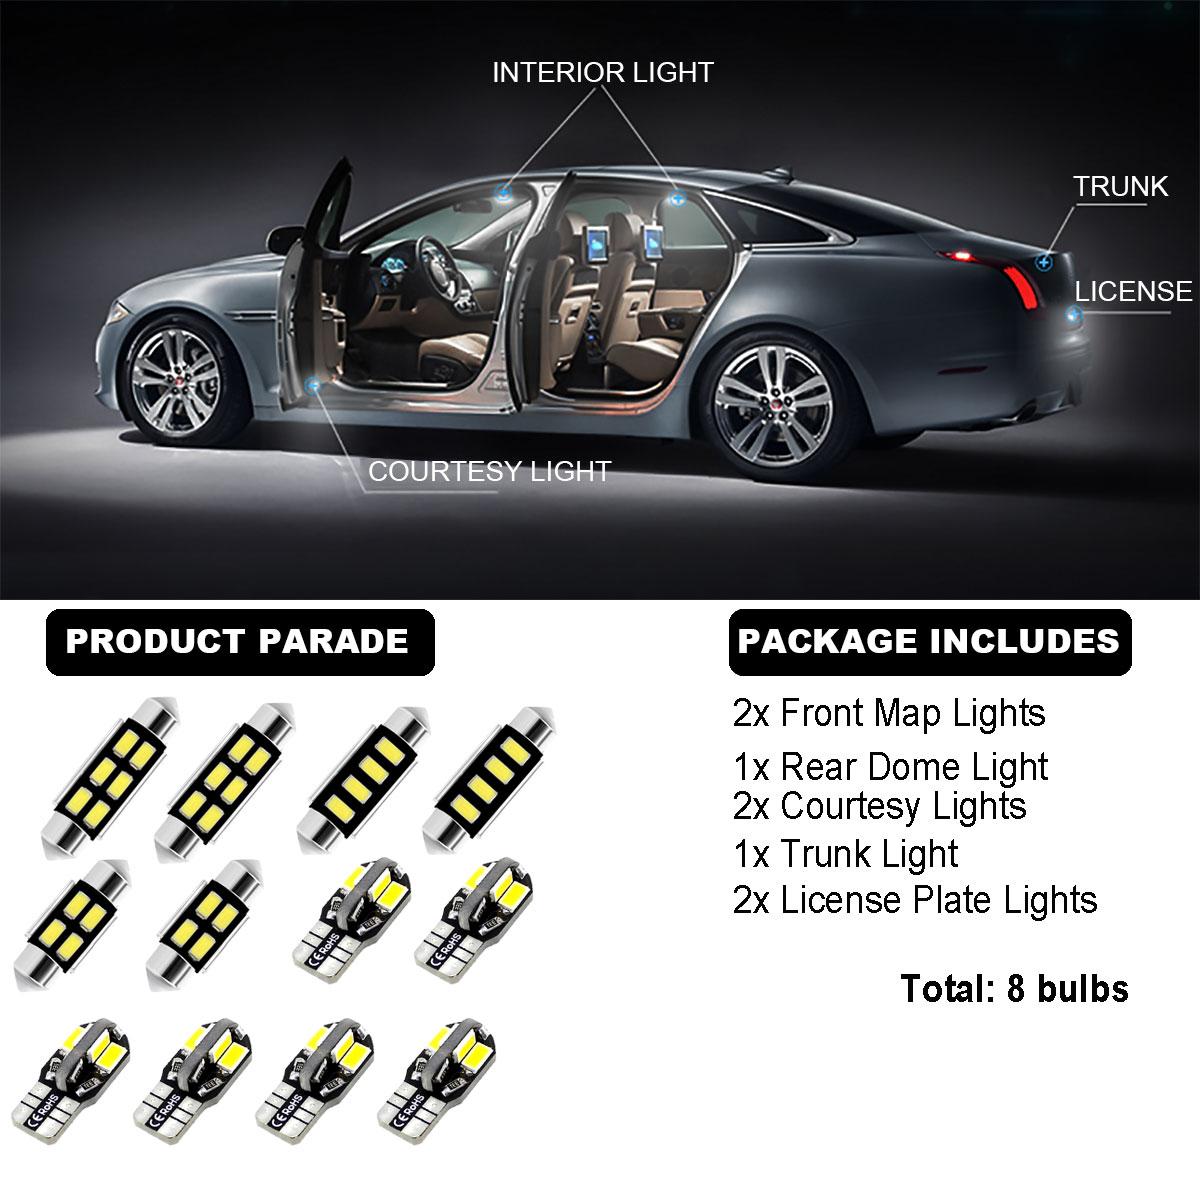 8Bulbs LED Interior Dome Light Kit HID Super White 6000K